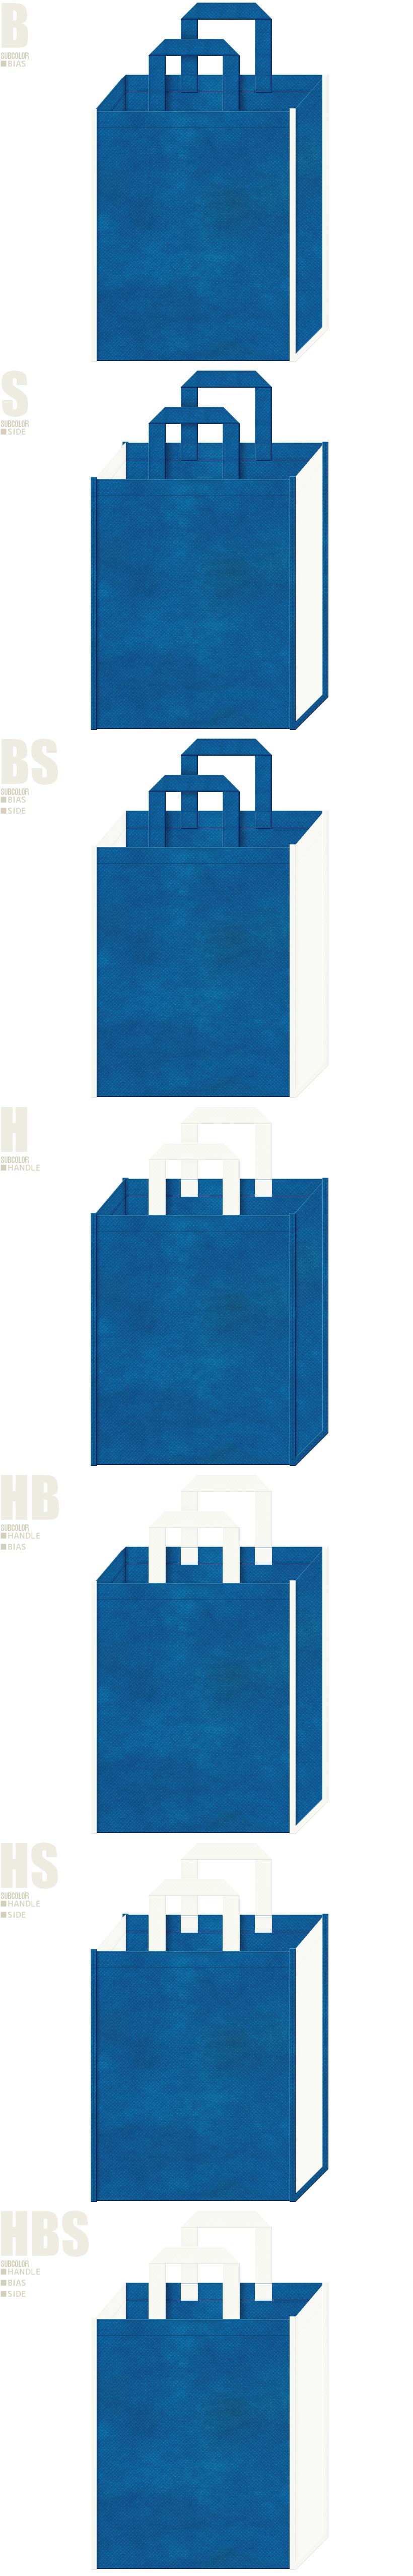 LED・人工知能・水素自動車・セキュリティ・電子部品の展示会用バッグにお奨めの不織布バッグデザイン:青色とオフホワイト色の不織布バッグ配色7パターン。